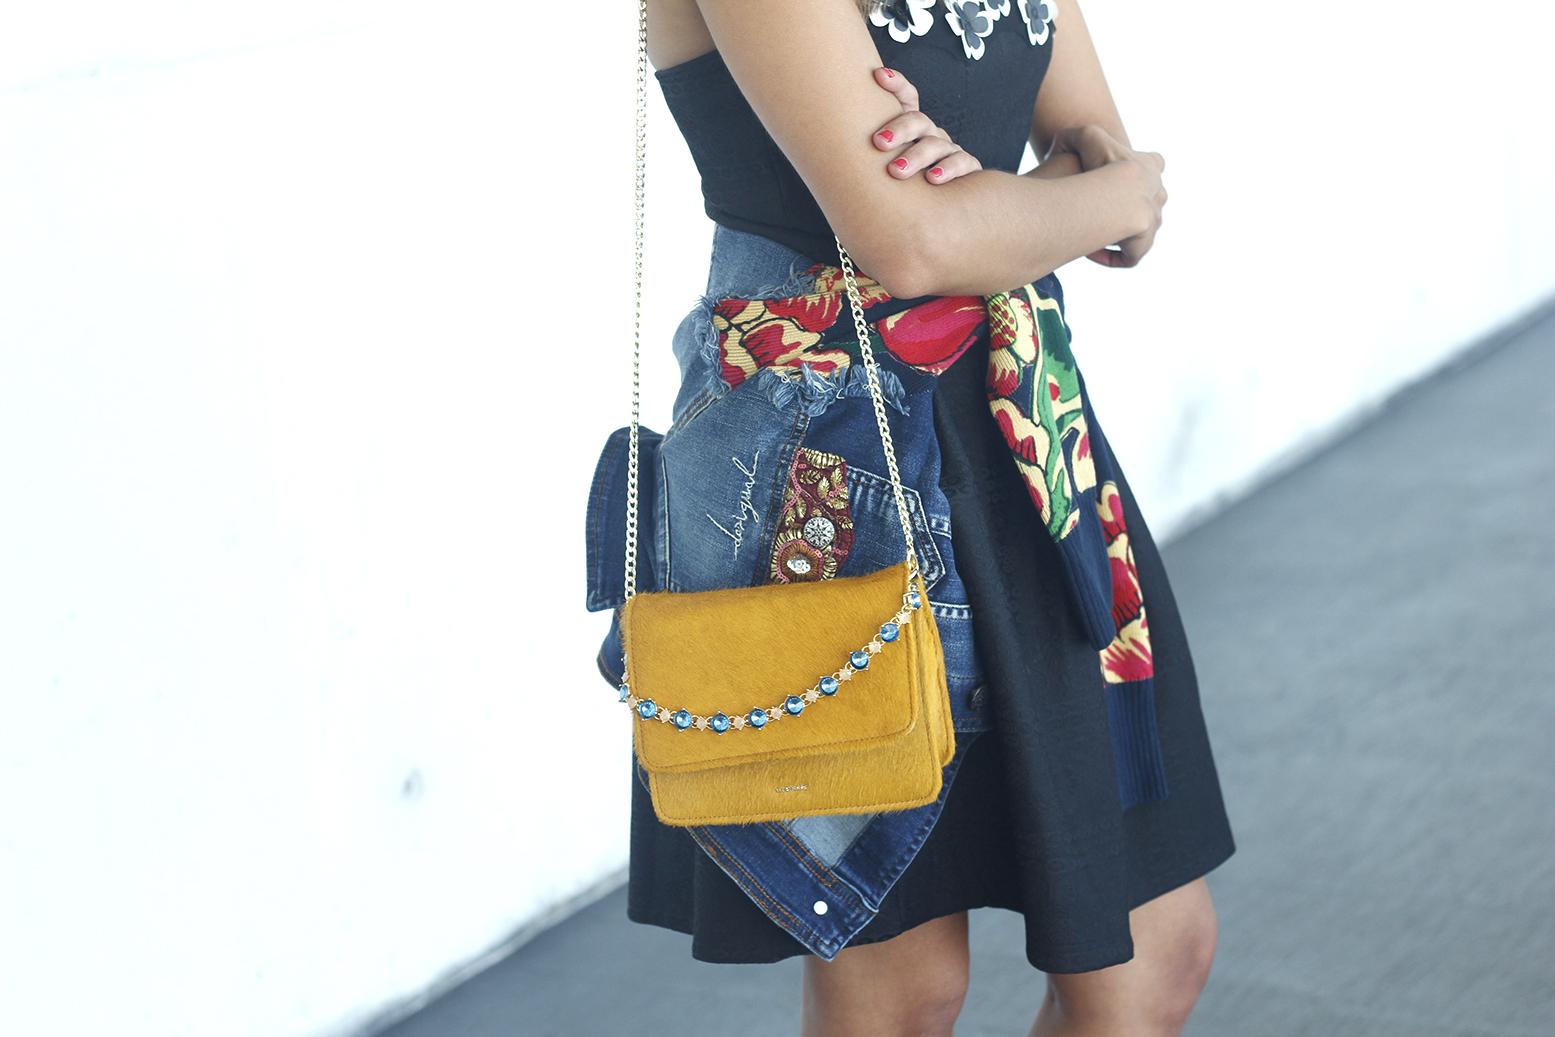 desigual black dress and denim jacket for fashion week madrid outfit fashion12